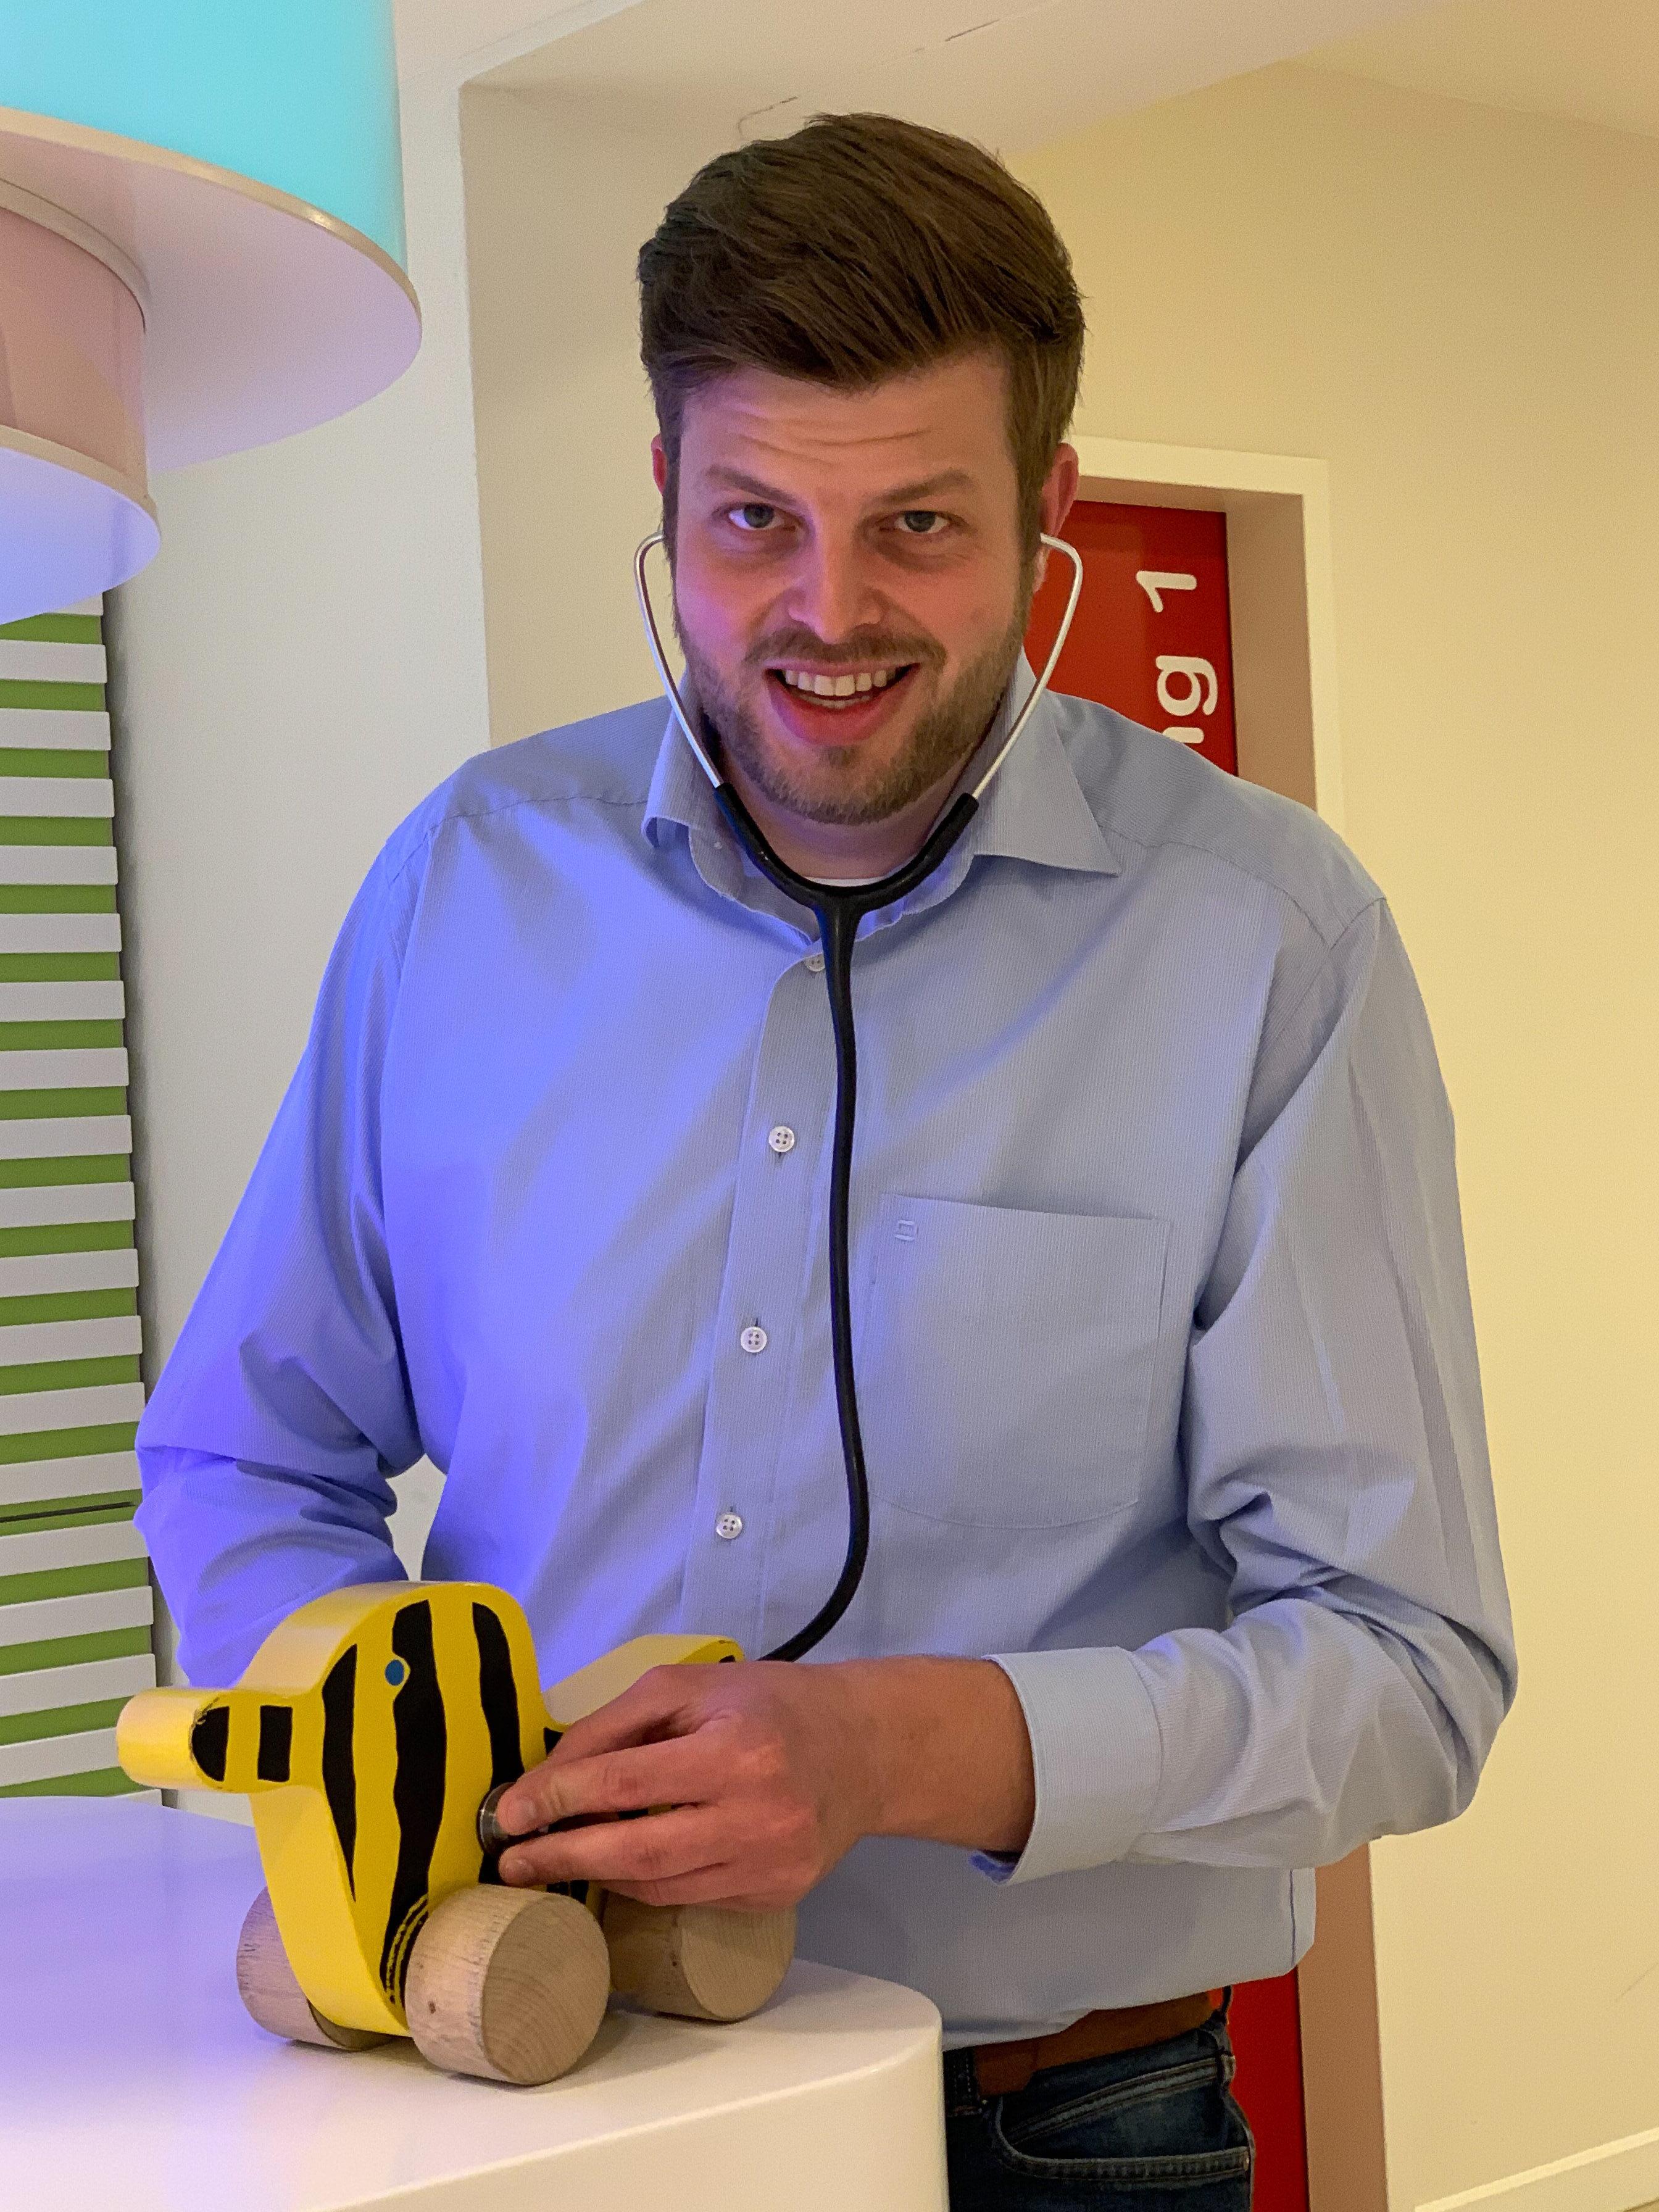 Dr. Markus Ascher